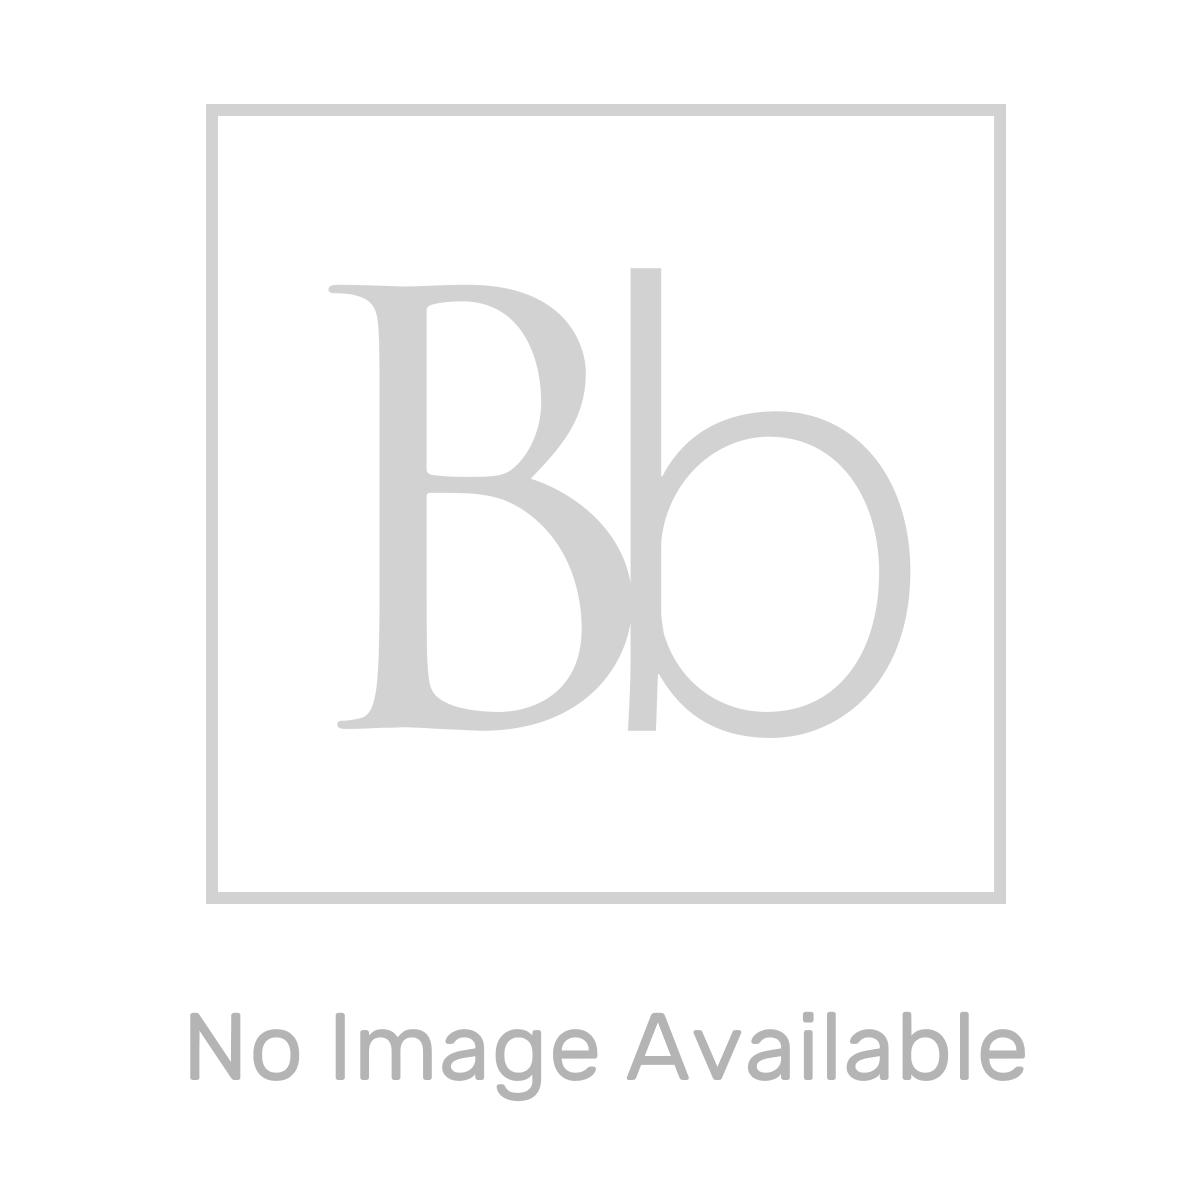 Nuie Athena Hacienda Black Double Mirrored Bathroom Cabinet 600mm Line Drawing